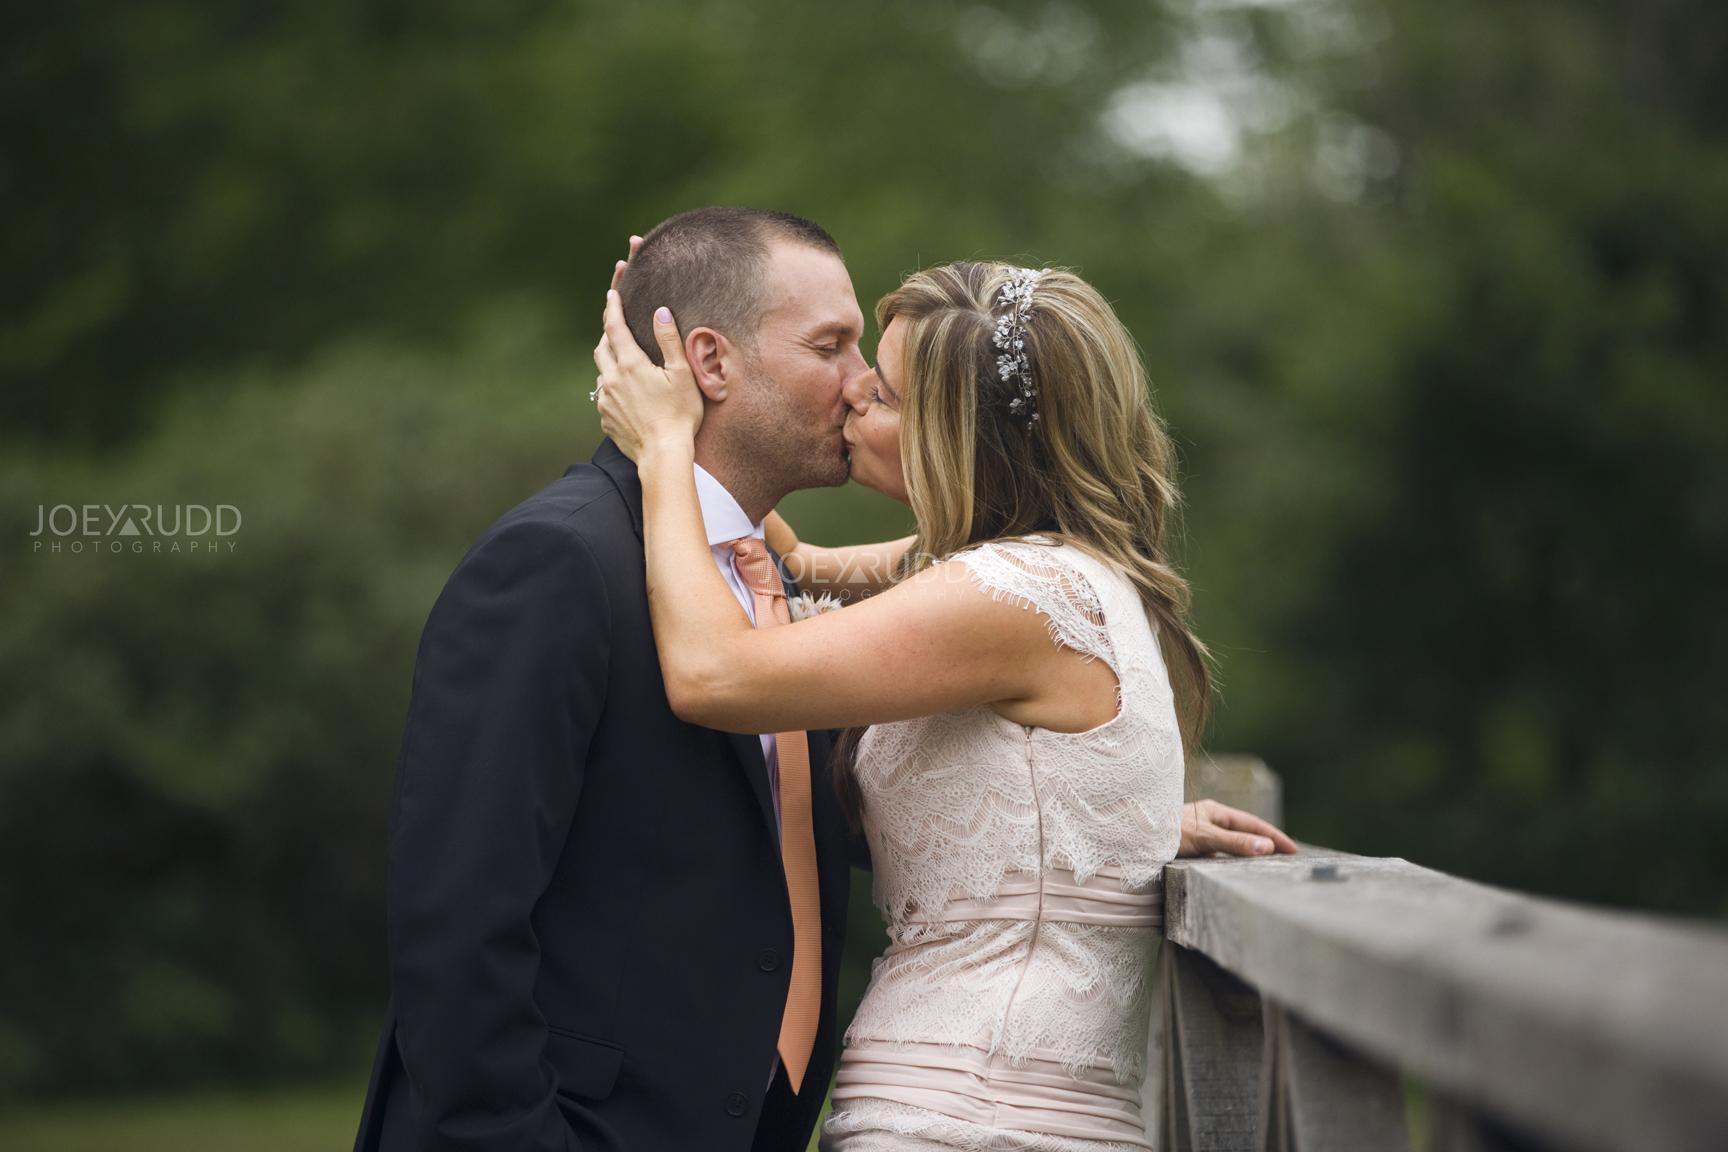 Elopement Wedding by Ottawa Wedding Photographer Joey Rudd Photography Arboretum Kiss